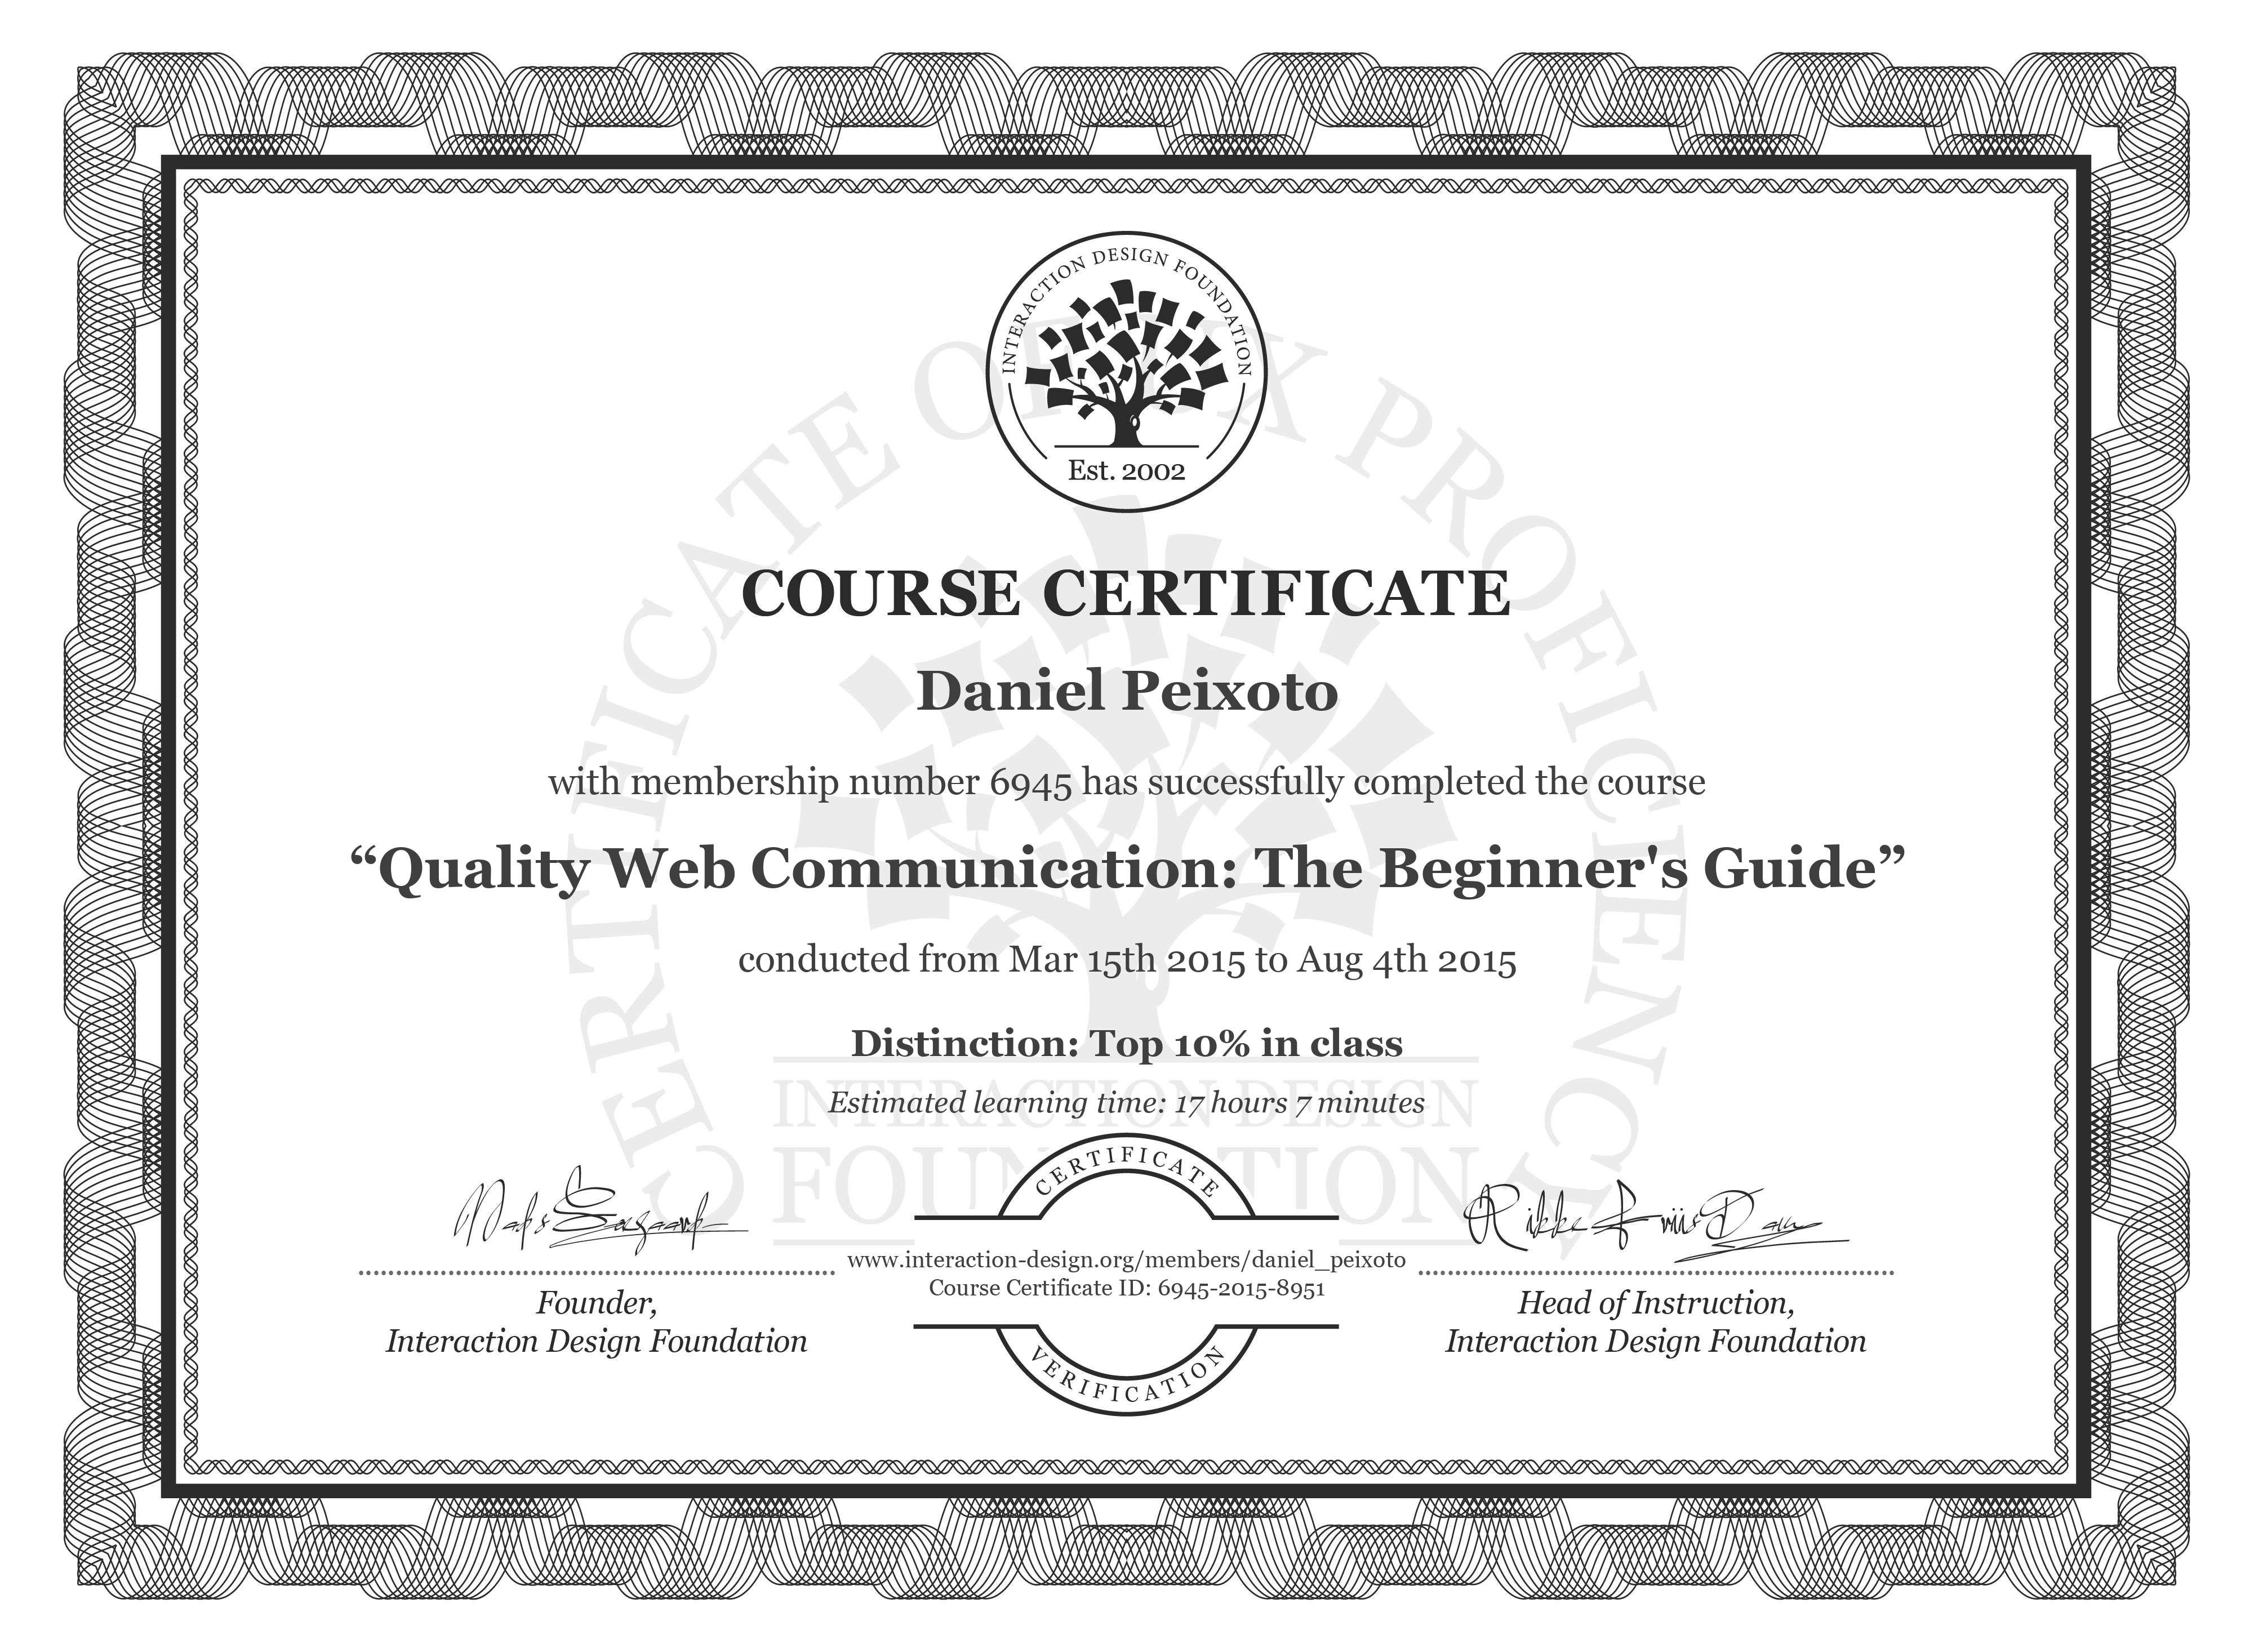 Daniel Peixoto's Course Certificate: Quality Web Communication: The Beginner's Guide